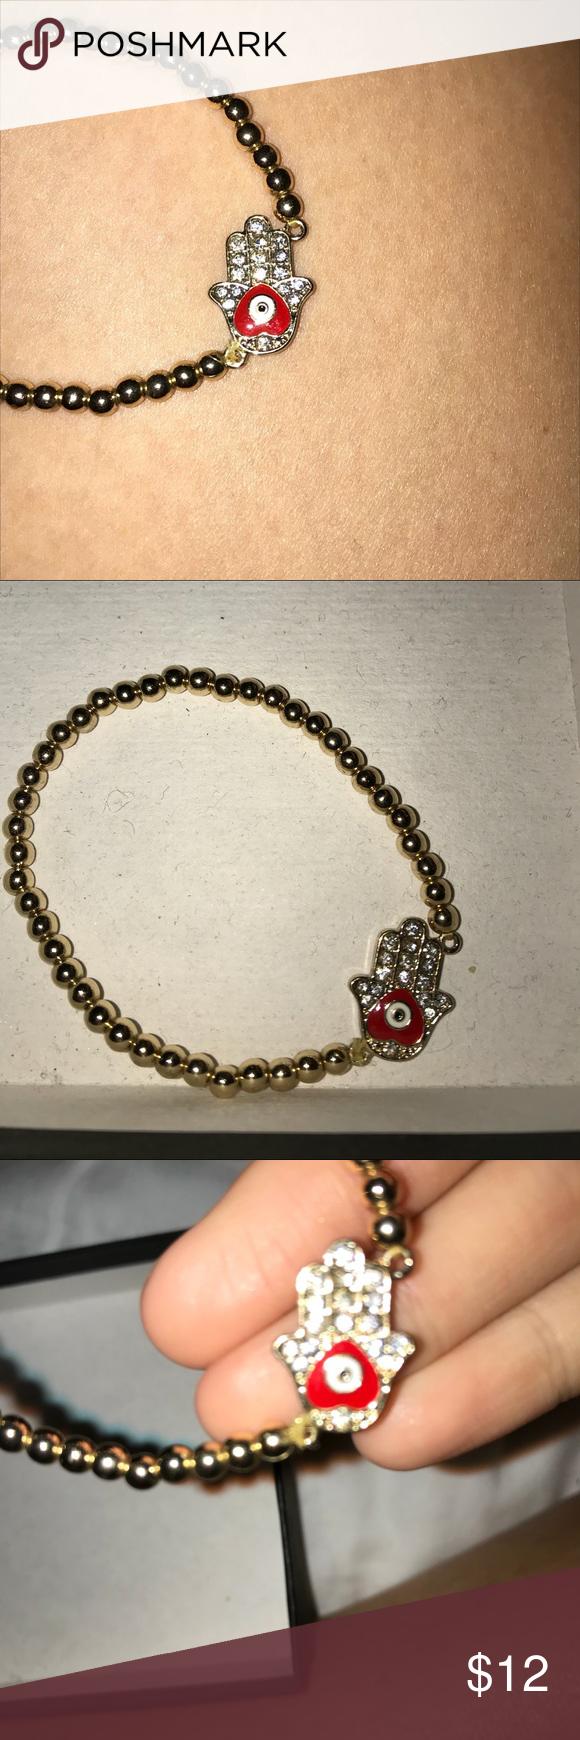 Evil Eye Bracelet Diamond Encrusted Red Evil Eye Bracelet Fred Segal Jewelry Bracelets Evil Eye Bracelet Bracelets Pandora Charm Bracelet